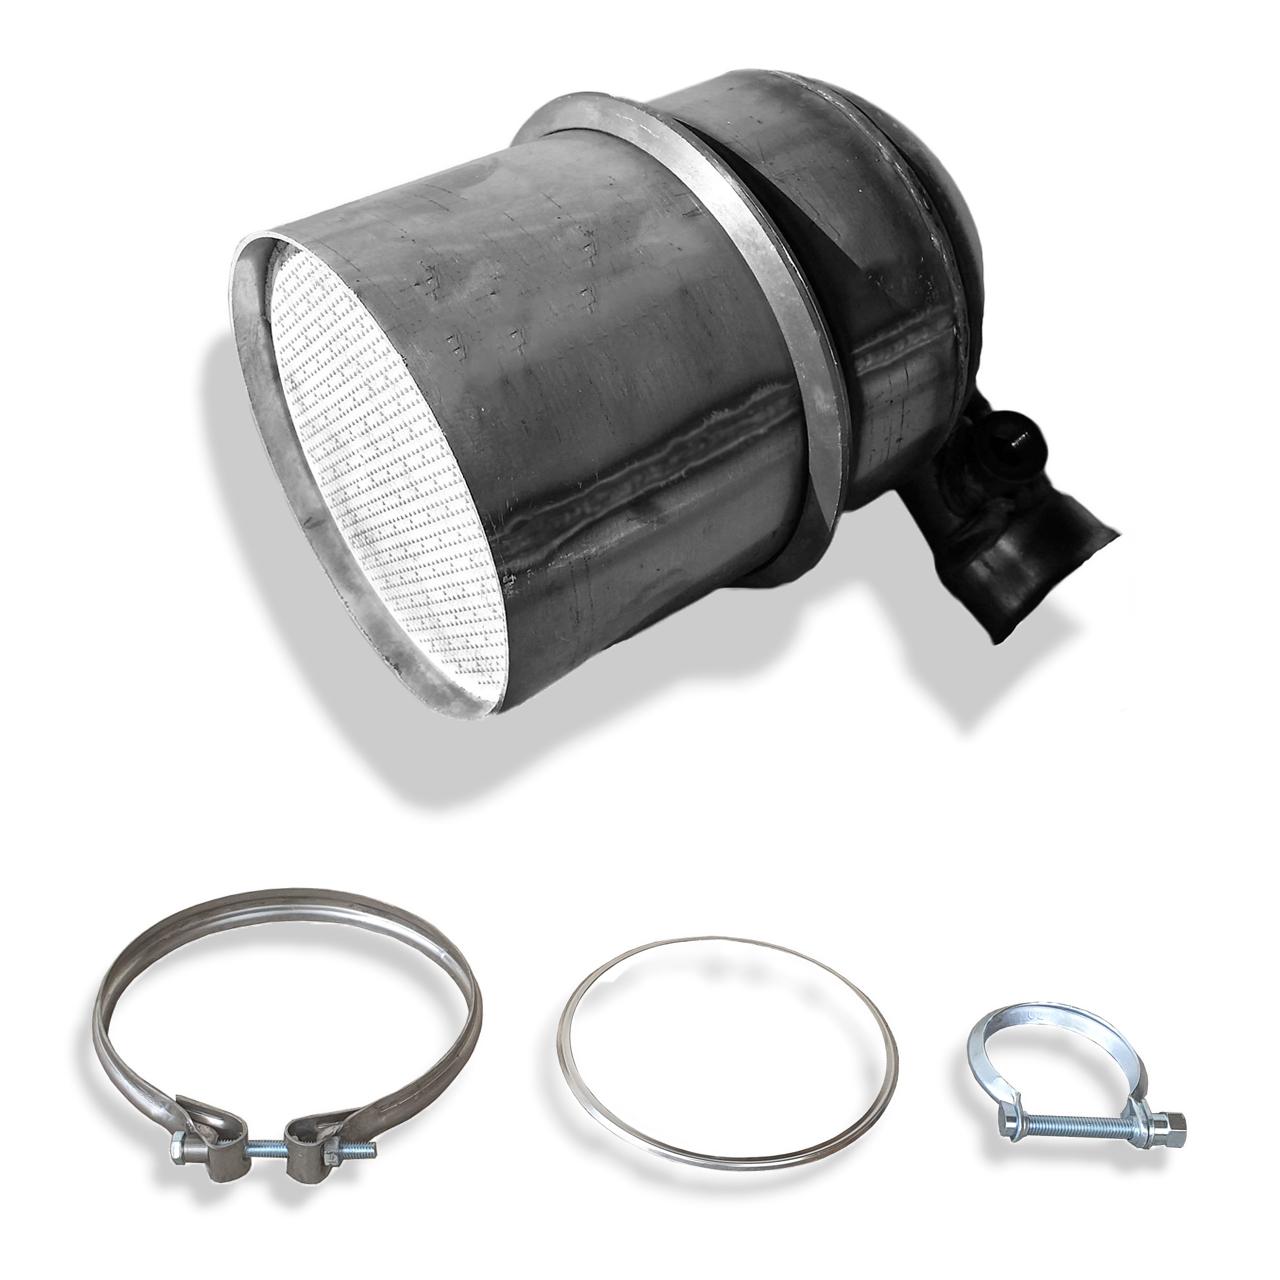 silencieux filtres particules peugeot 207 echappement auto. Black Bedroom Furniture Sets. Home Design Ideas